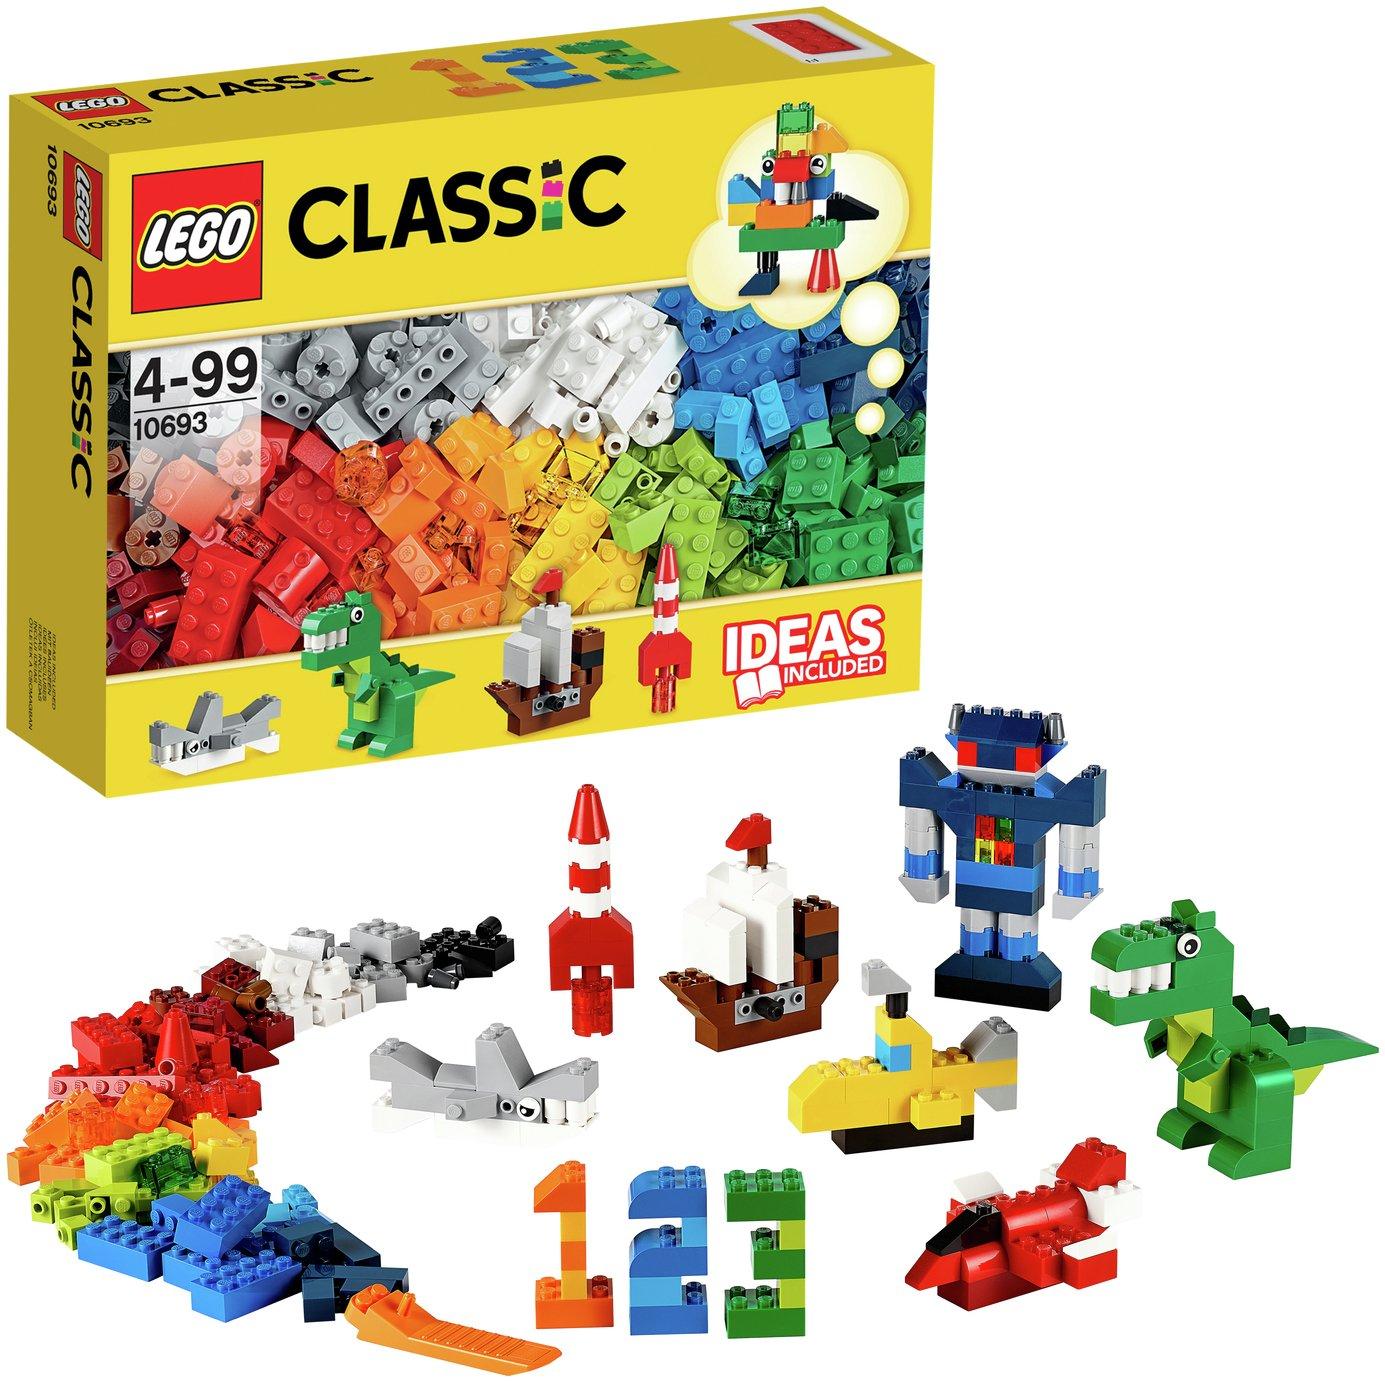 Buy LEGO Classic Creative Supplement - 10693 | LEGO | Argos